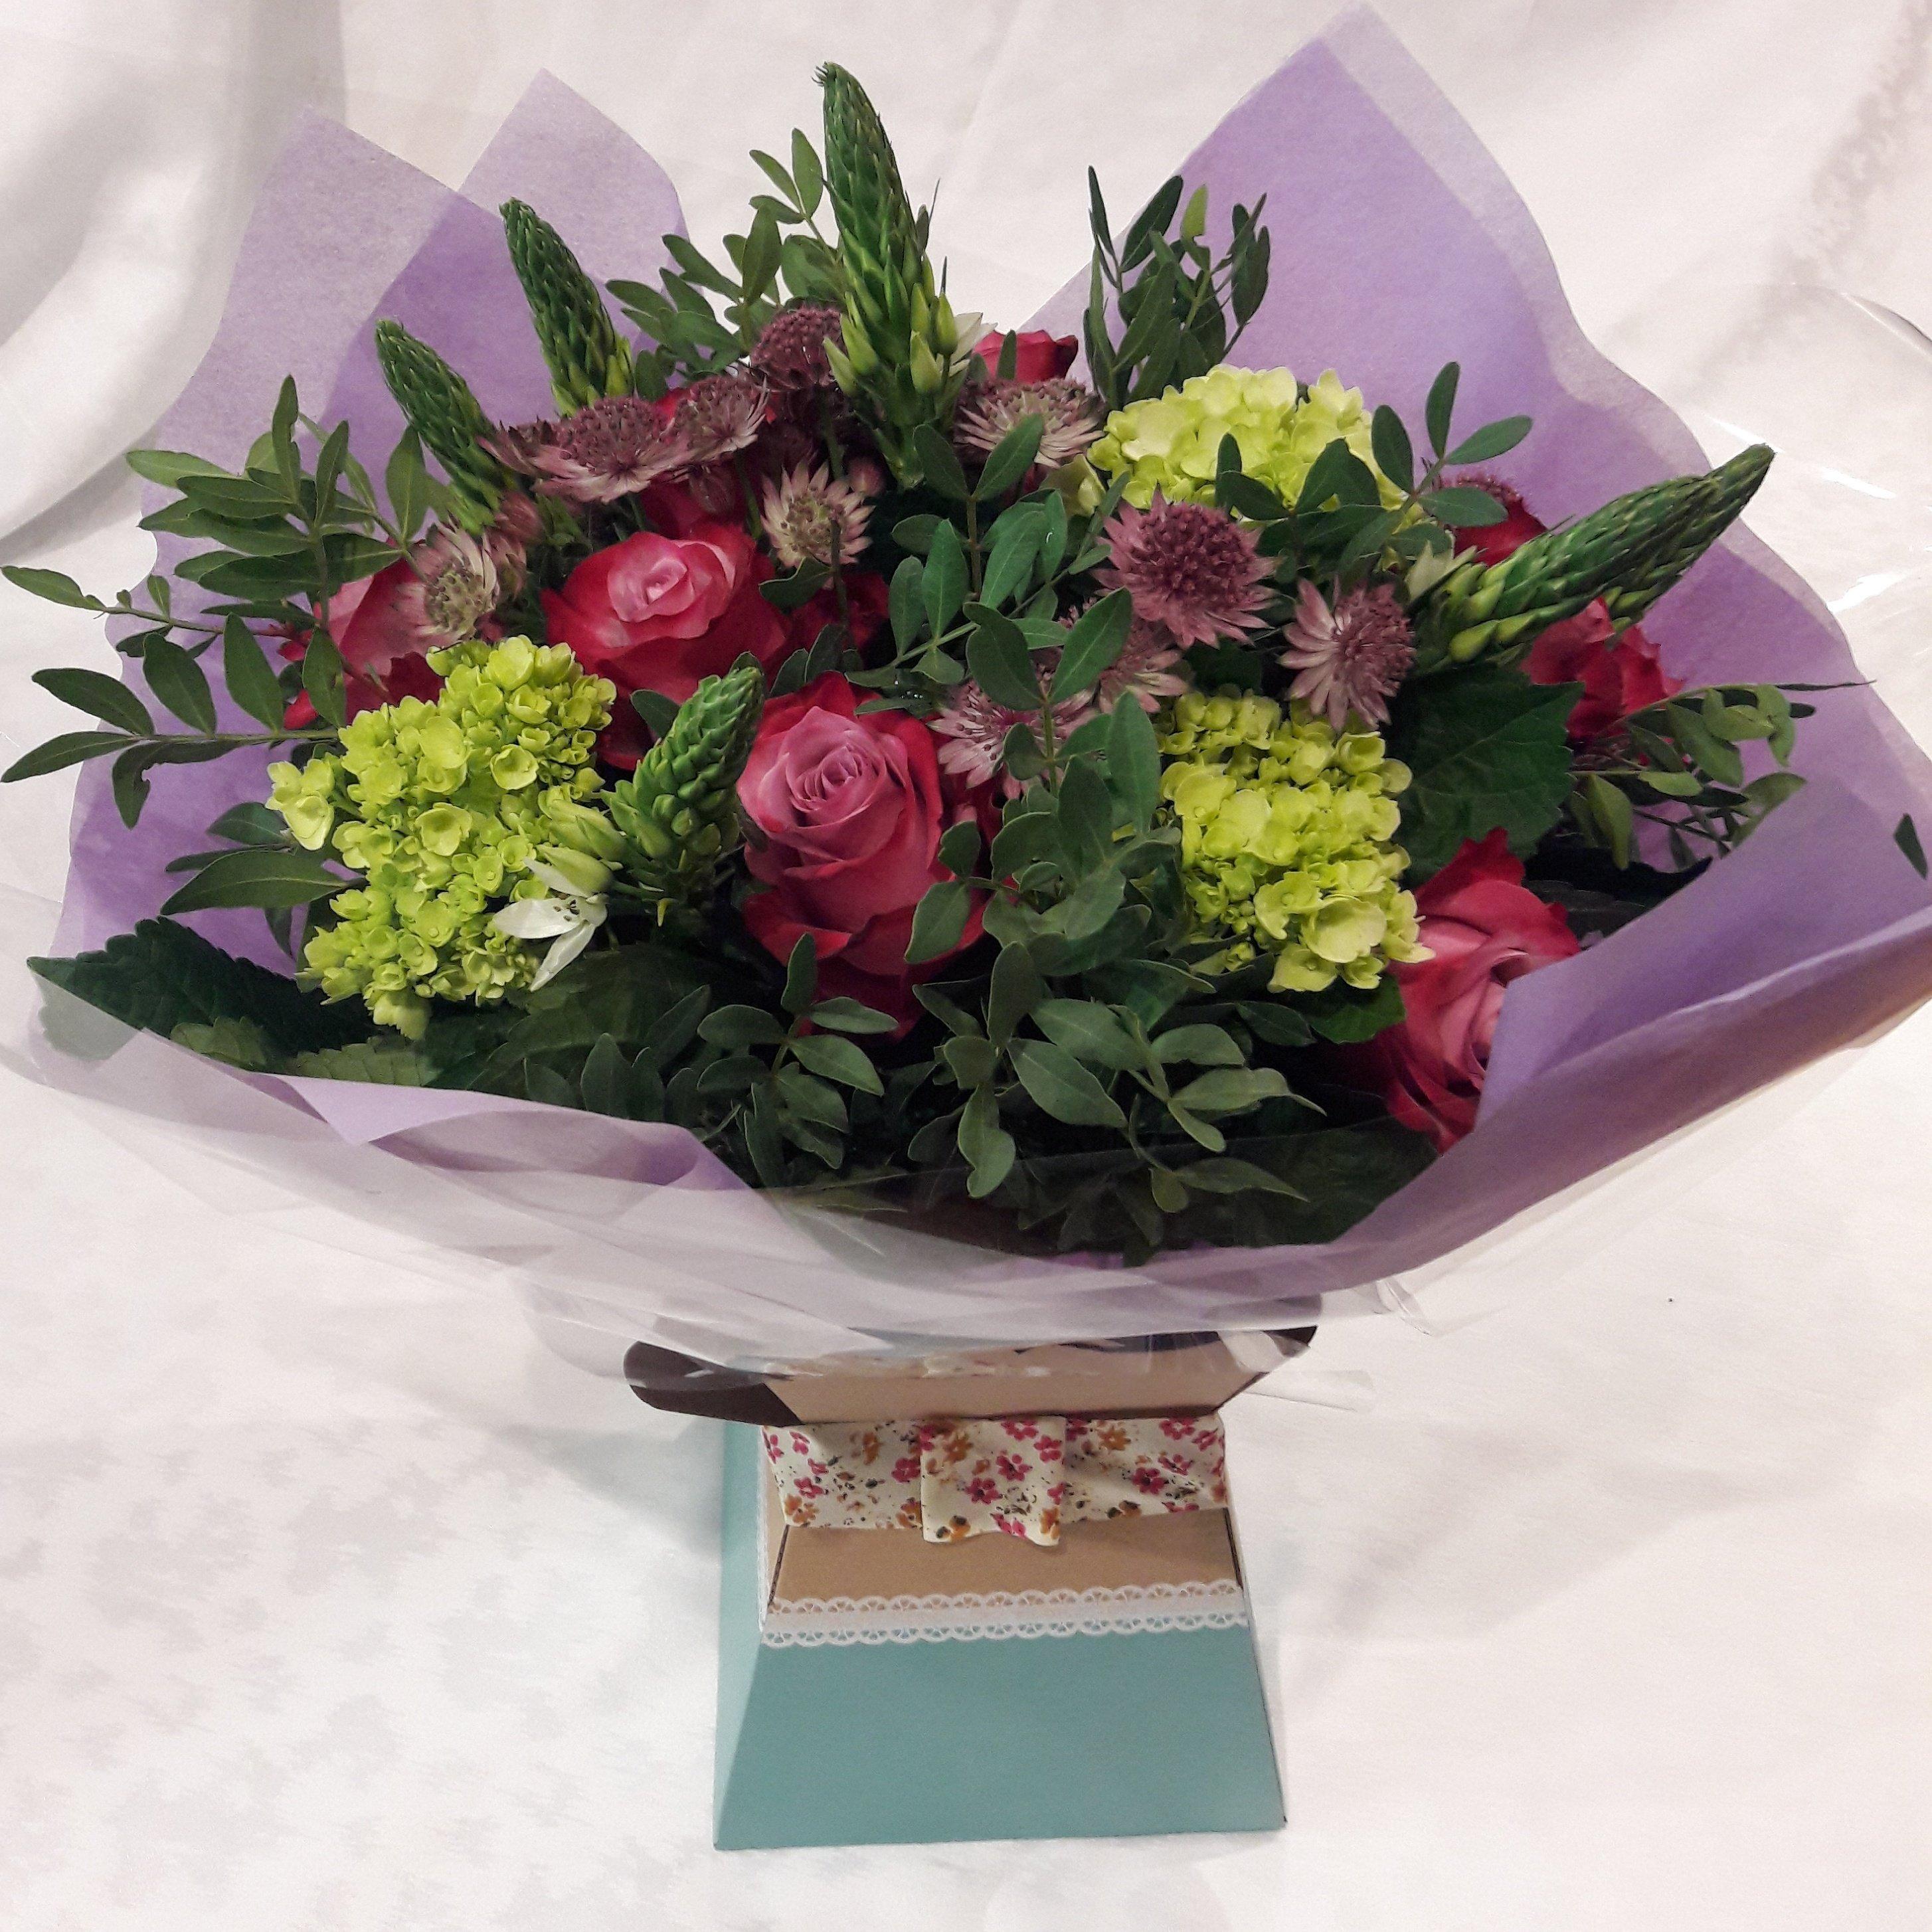 Roses and Hydrangeas 00008